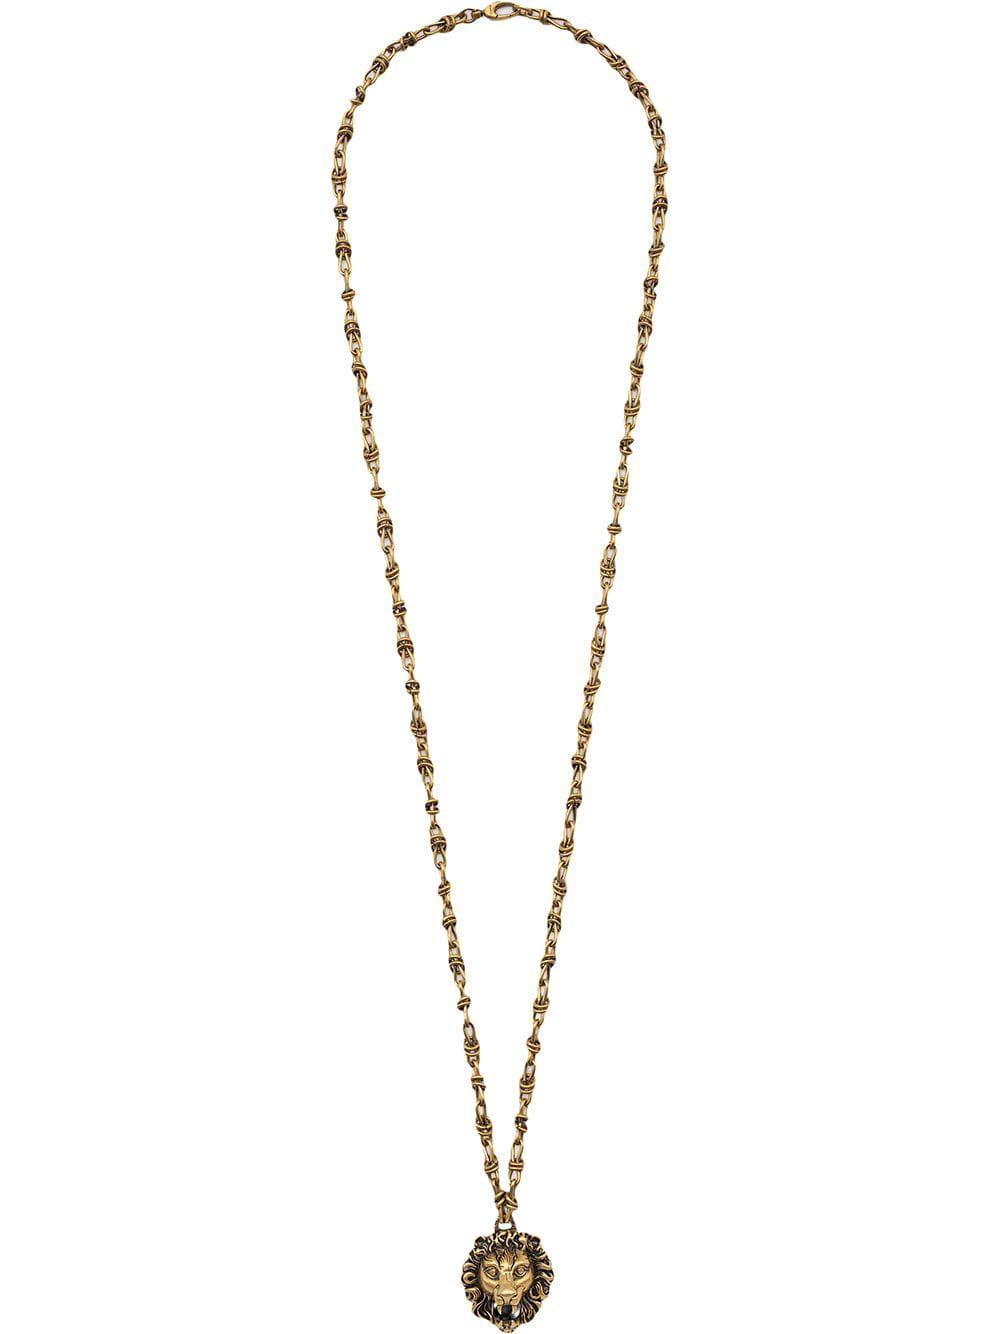 b9f0951c1 Gucci Lion Head Pendant Necklace - Pendant Design Ideas